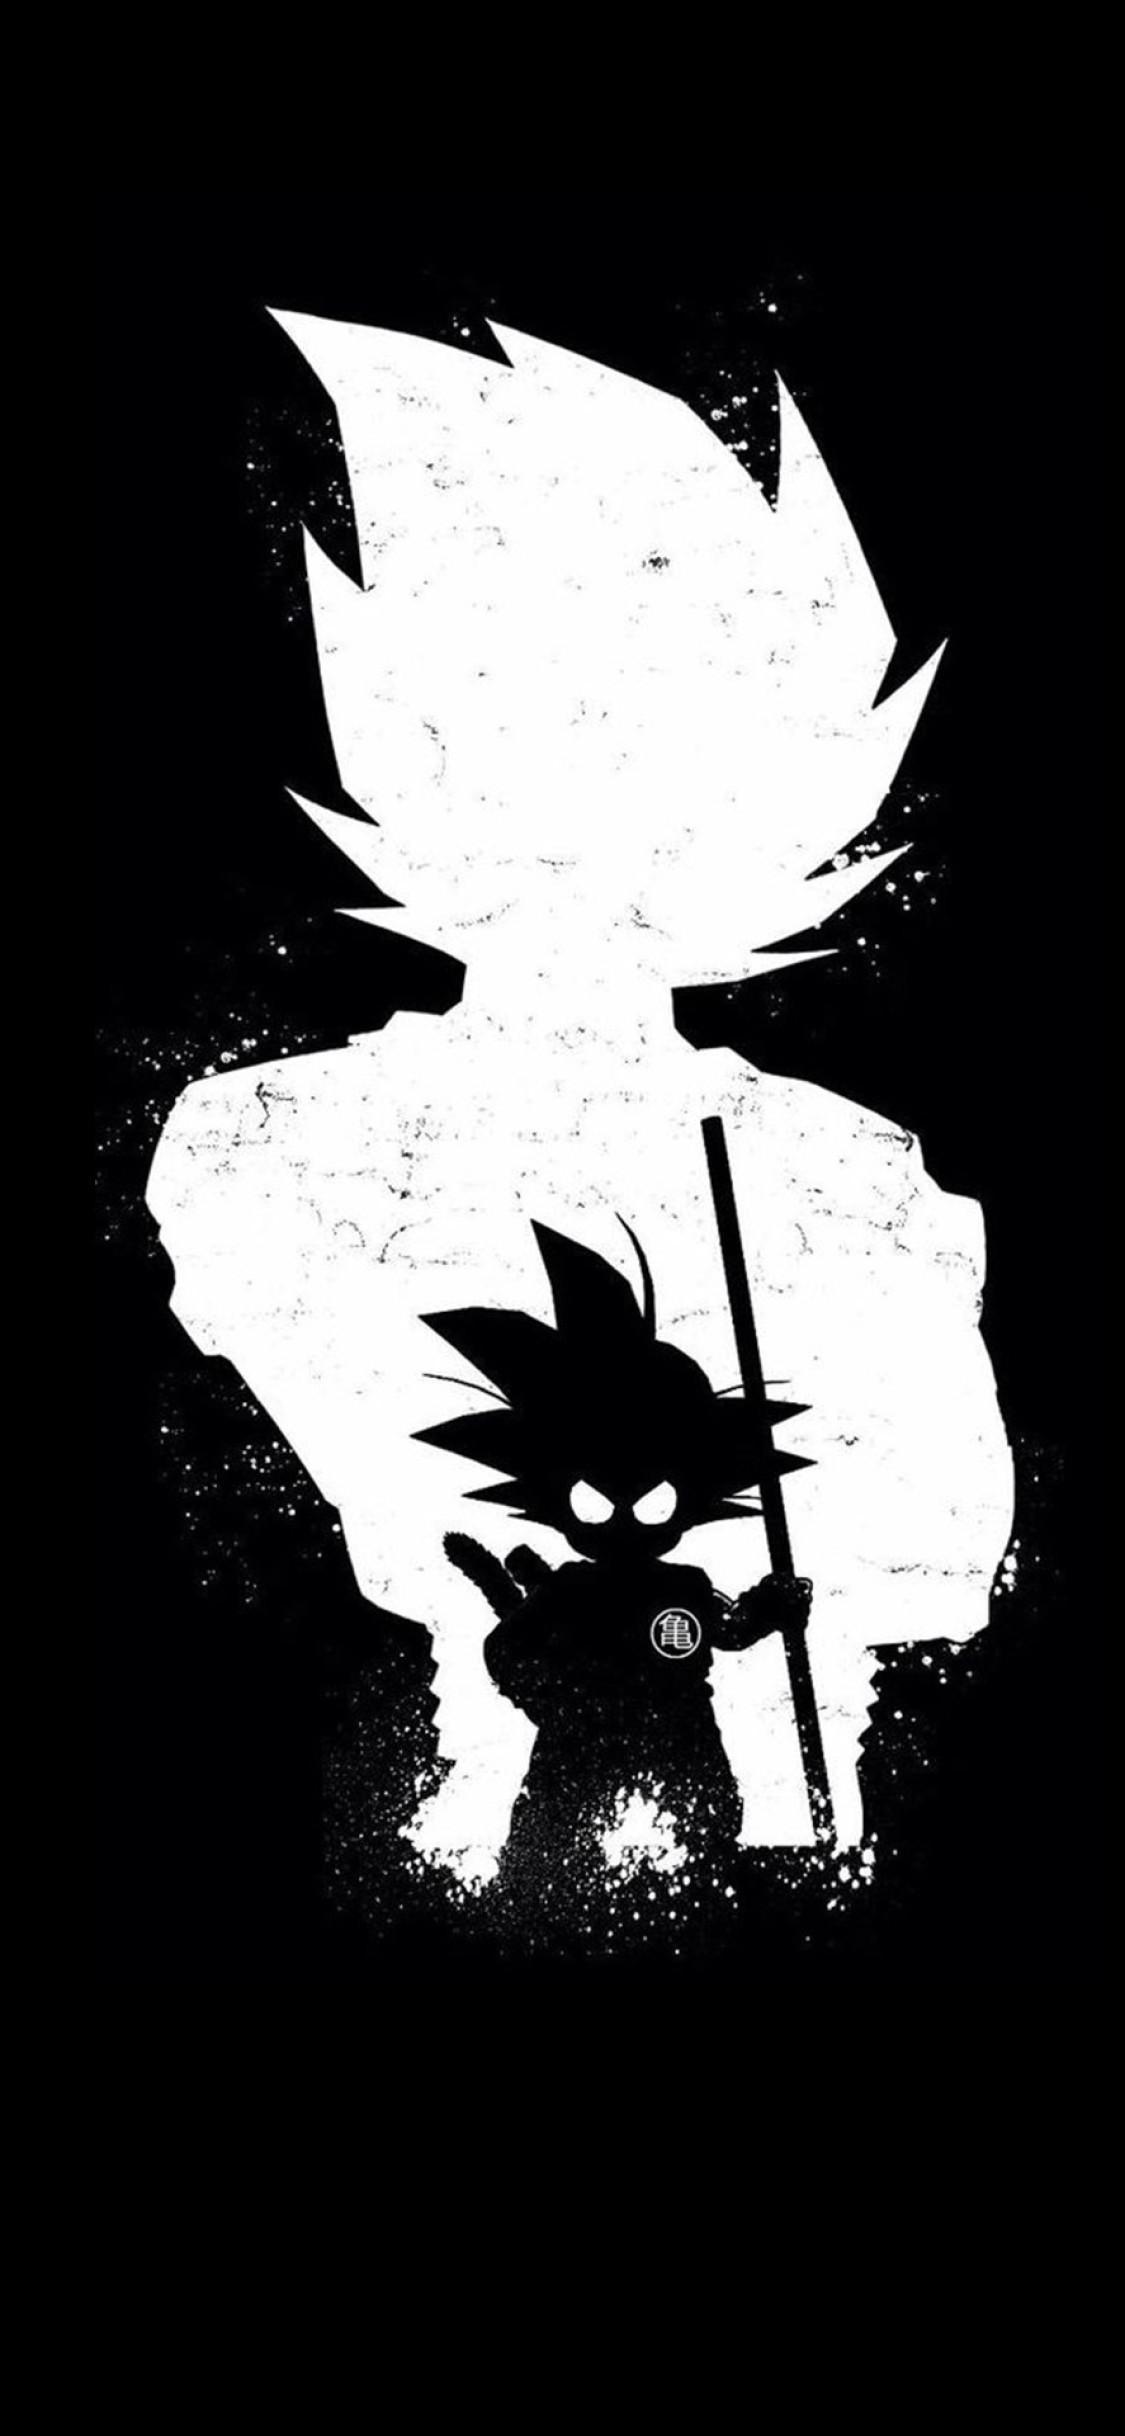 Aesthetic Anime Dark Wallpapers - Wallpaper Cave